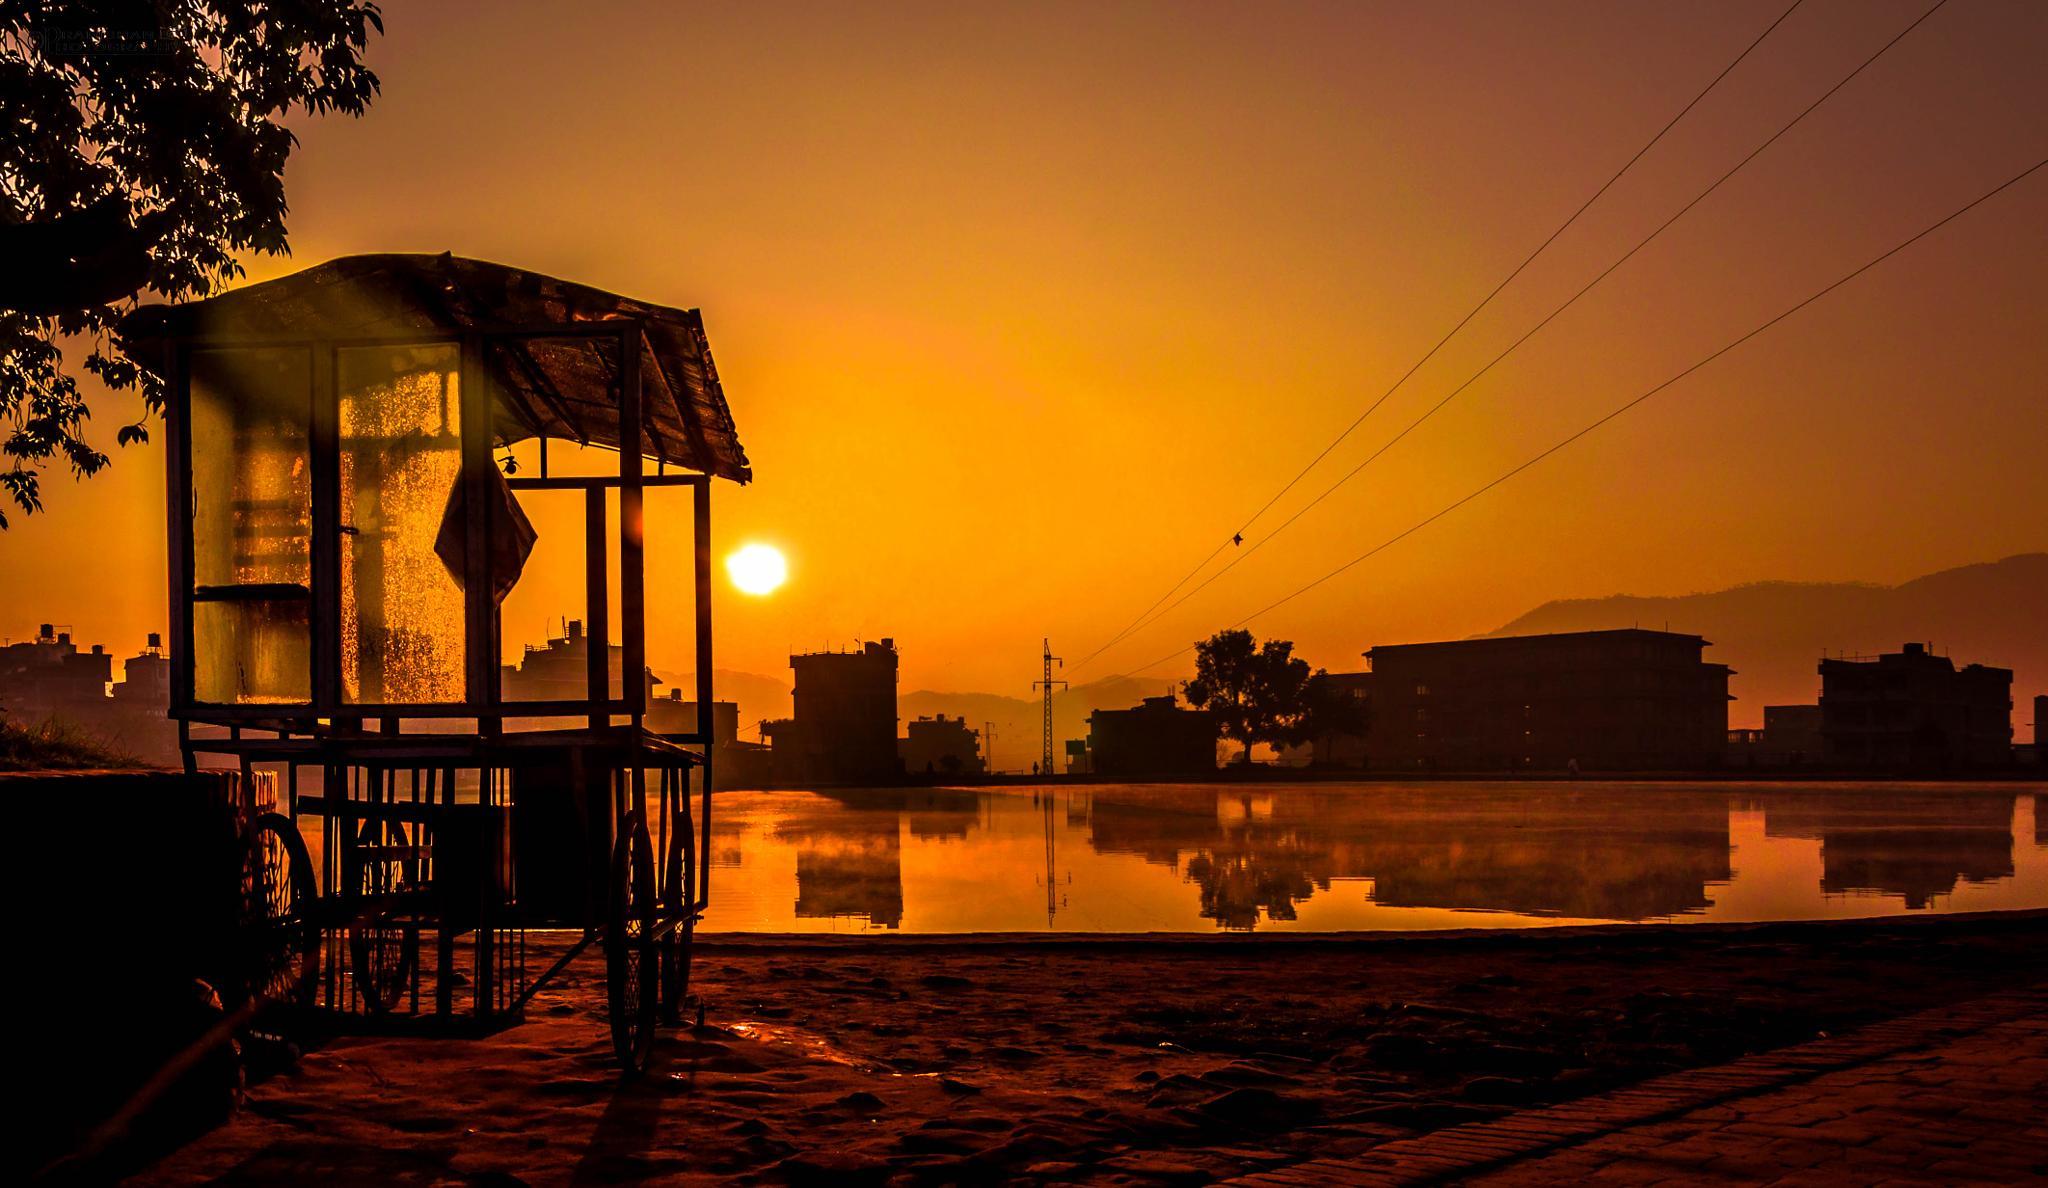 Morning view  by Pranishan Rajbhandari